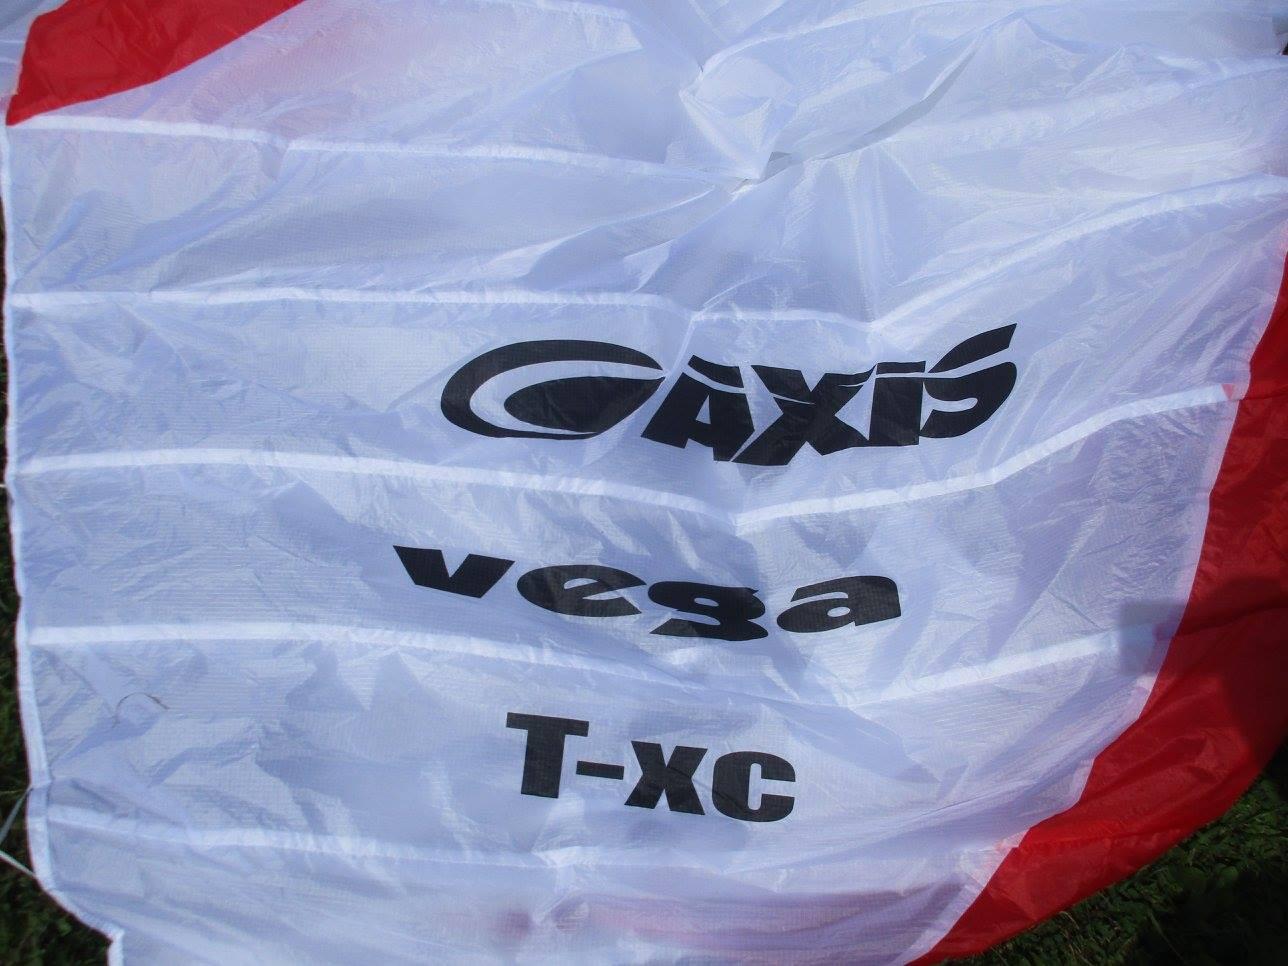 Axis Vega-XCT - Vega XCT - тандемный параплан